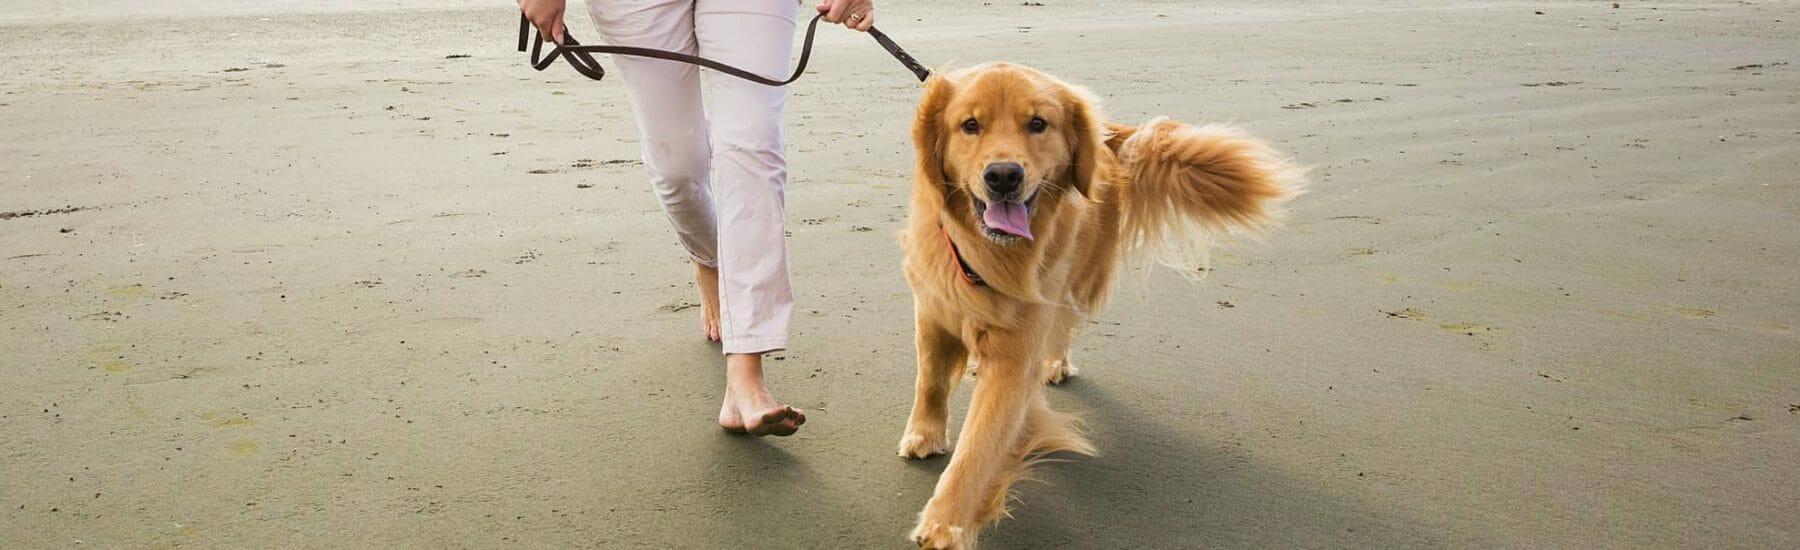 Golden retriever walking on a leash on the beach